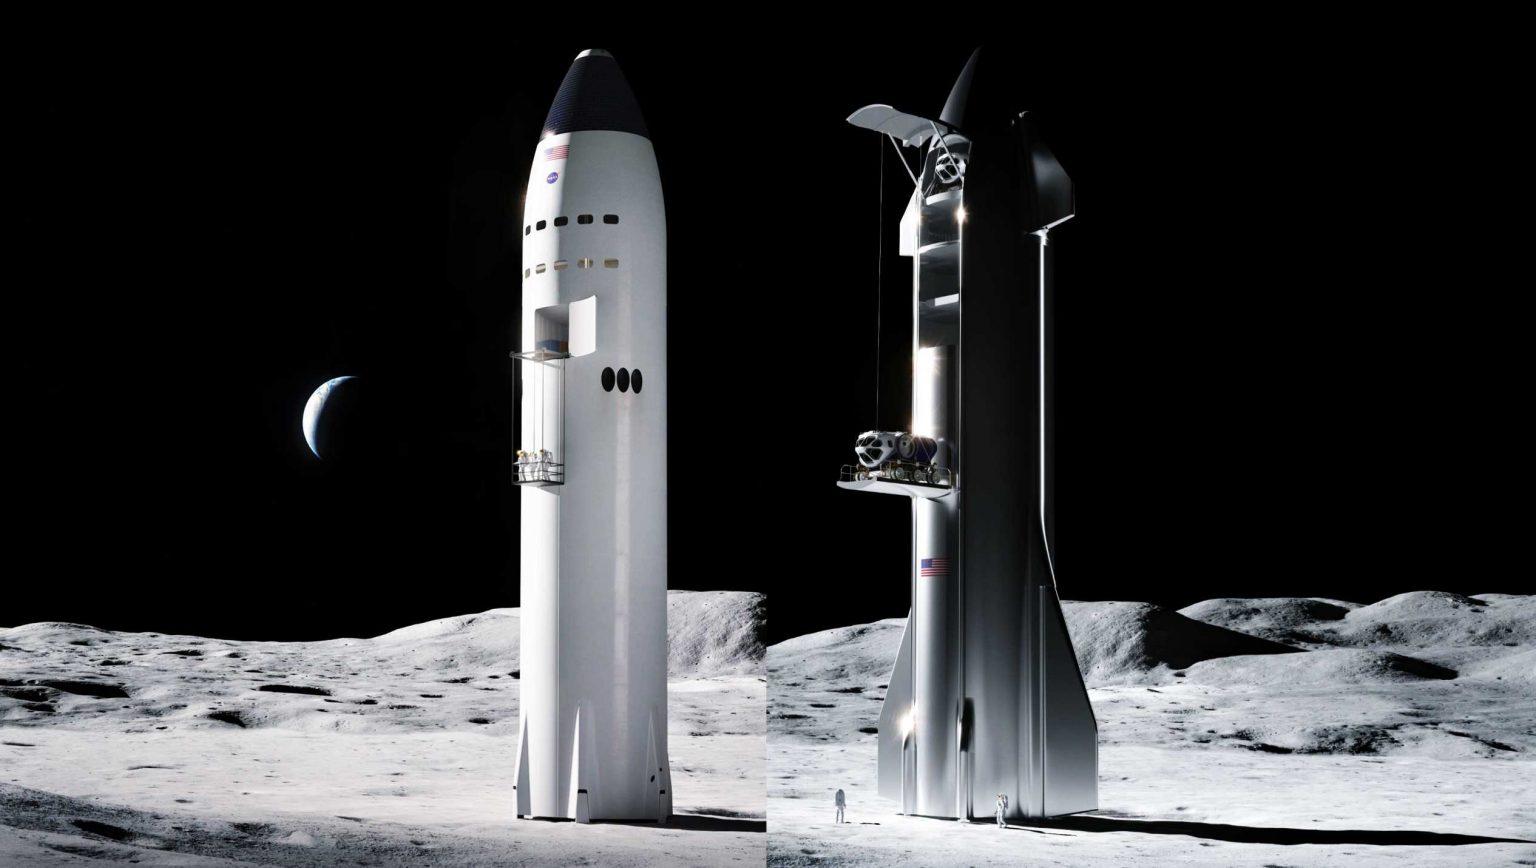 Starship-SpaceX-Moon-vs-Moon-1-c-1536x868.jpg